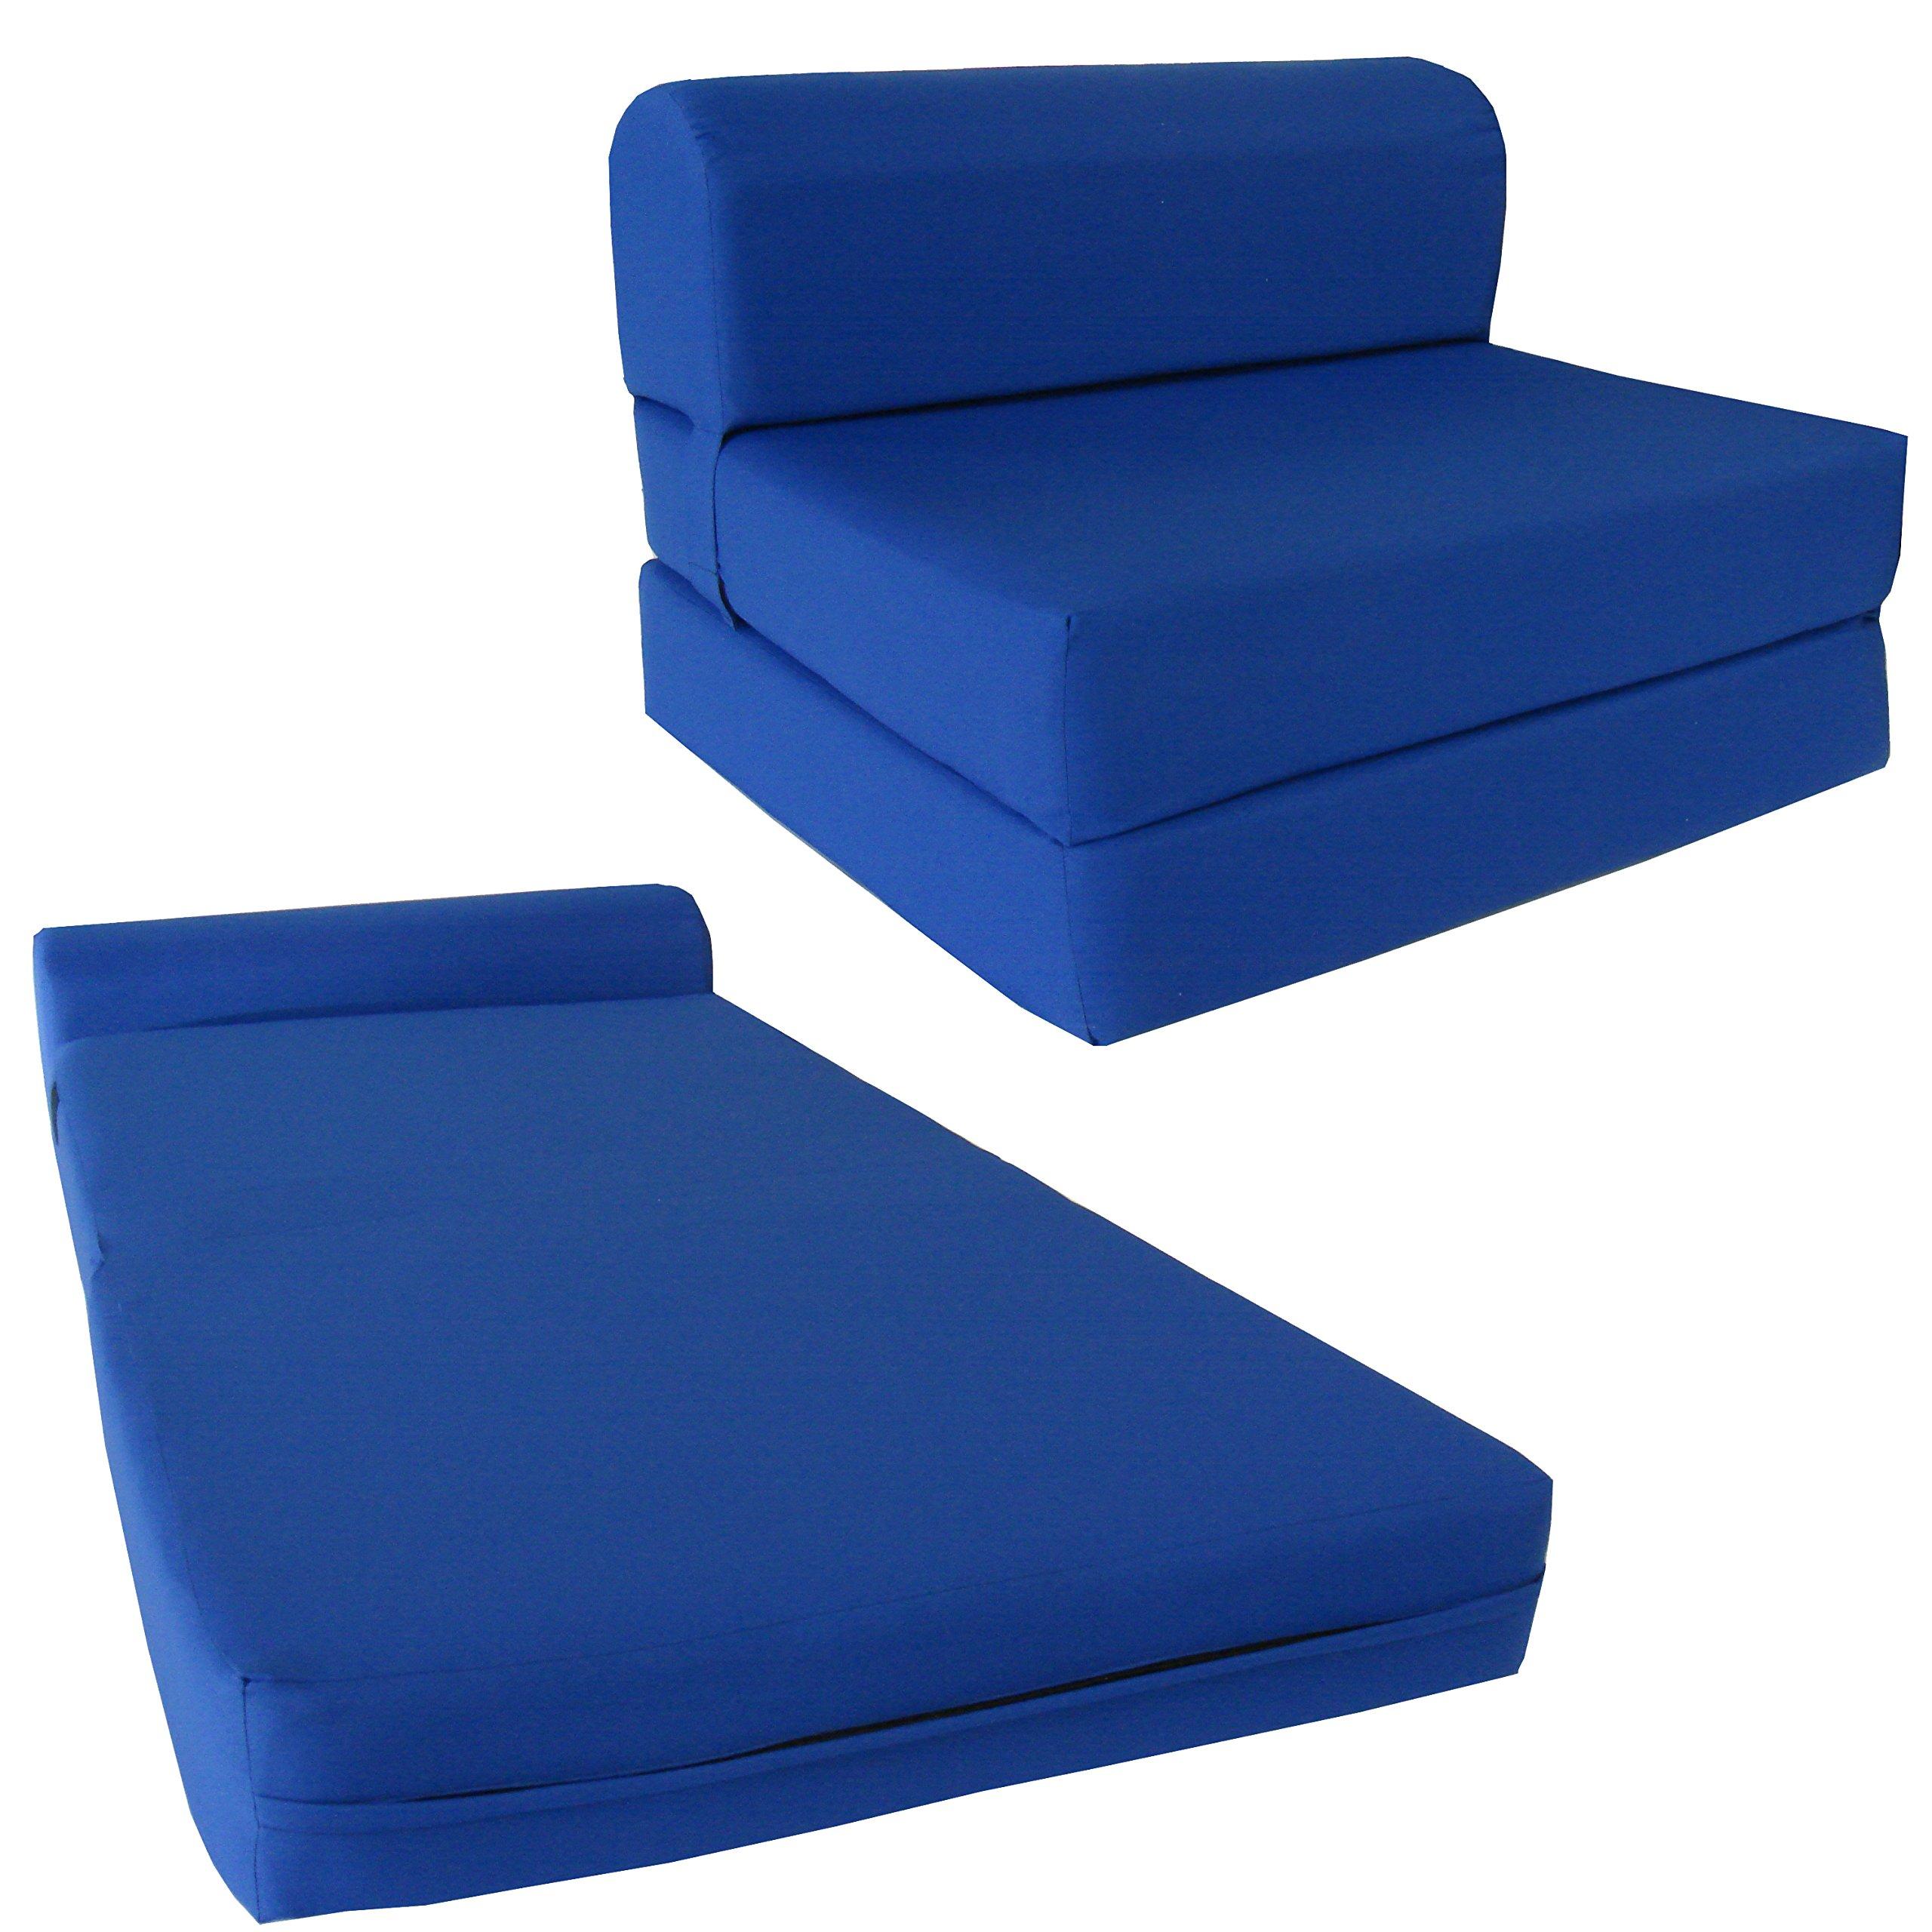 Chair Folding Foam Bed, Studio Sofa Guest Folded Foam Mattress (6'' x 58'' x 74'', Royal Blue)